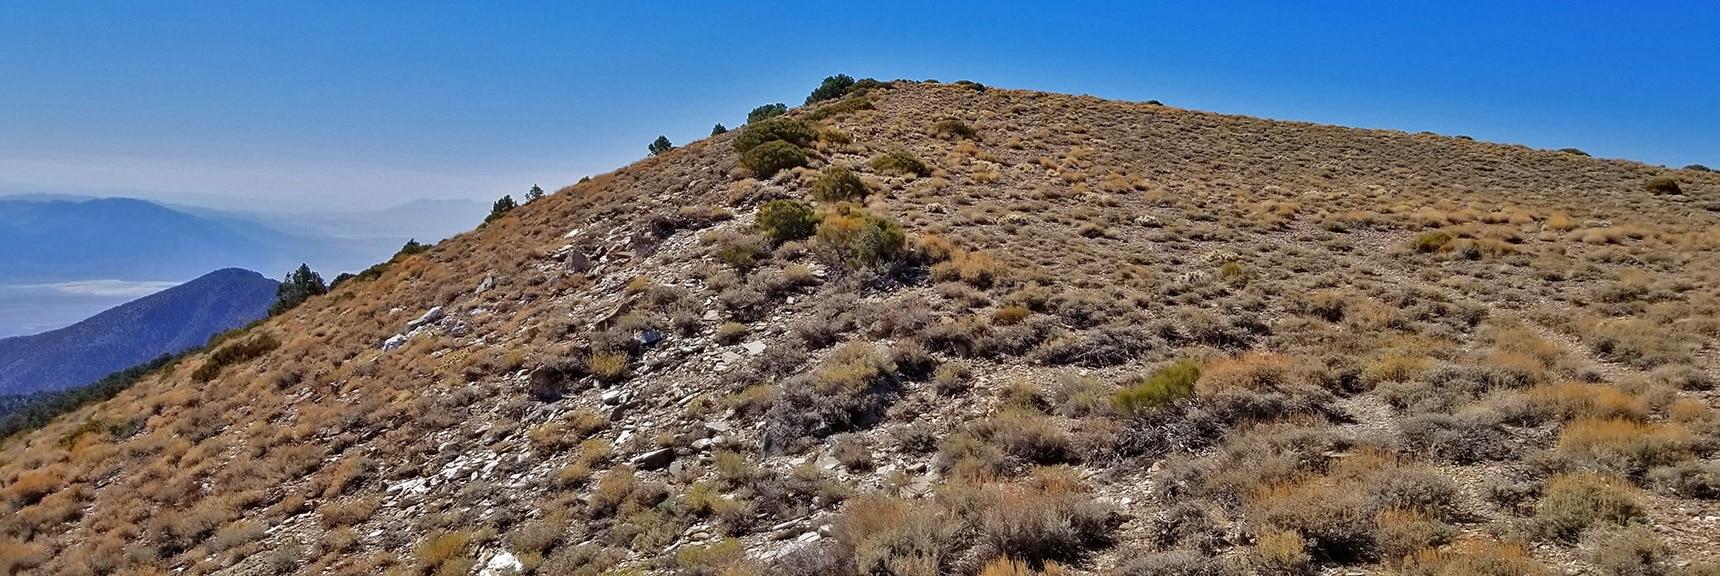 View of Mid Summit from Wildrose Peak Northern Summit Area   Wildrose Peak   Panamint Mountain Range   Death Valley National Park, California